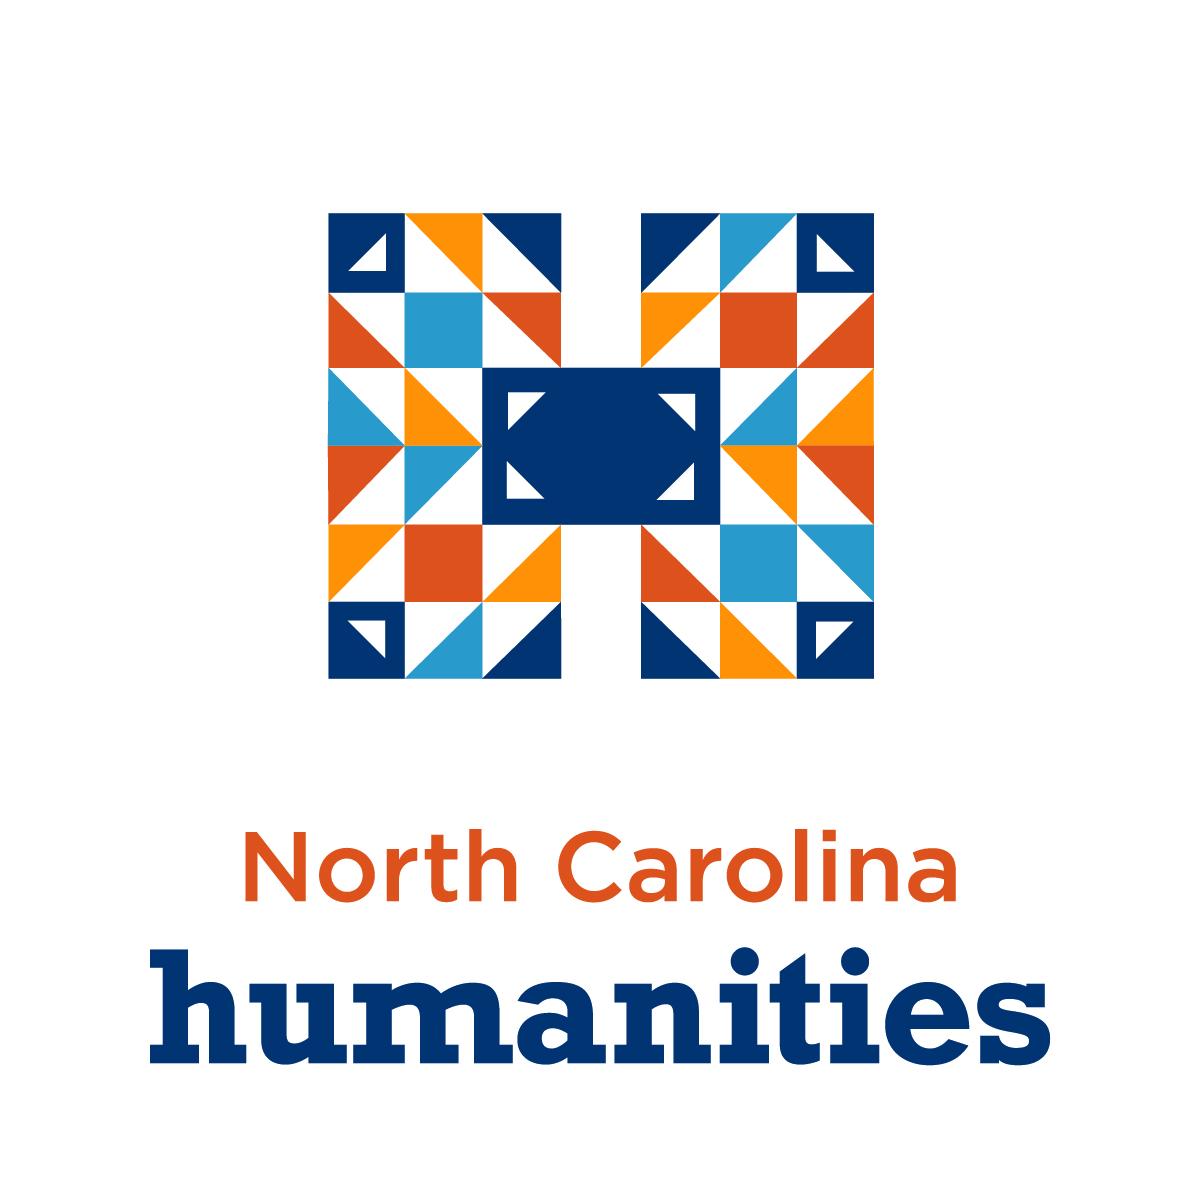 logo for the North Carolina Humanities